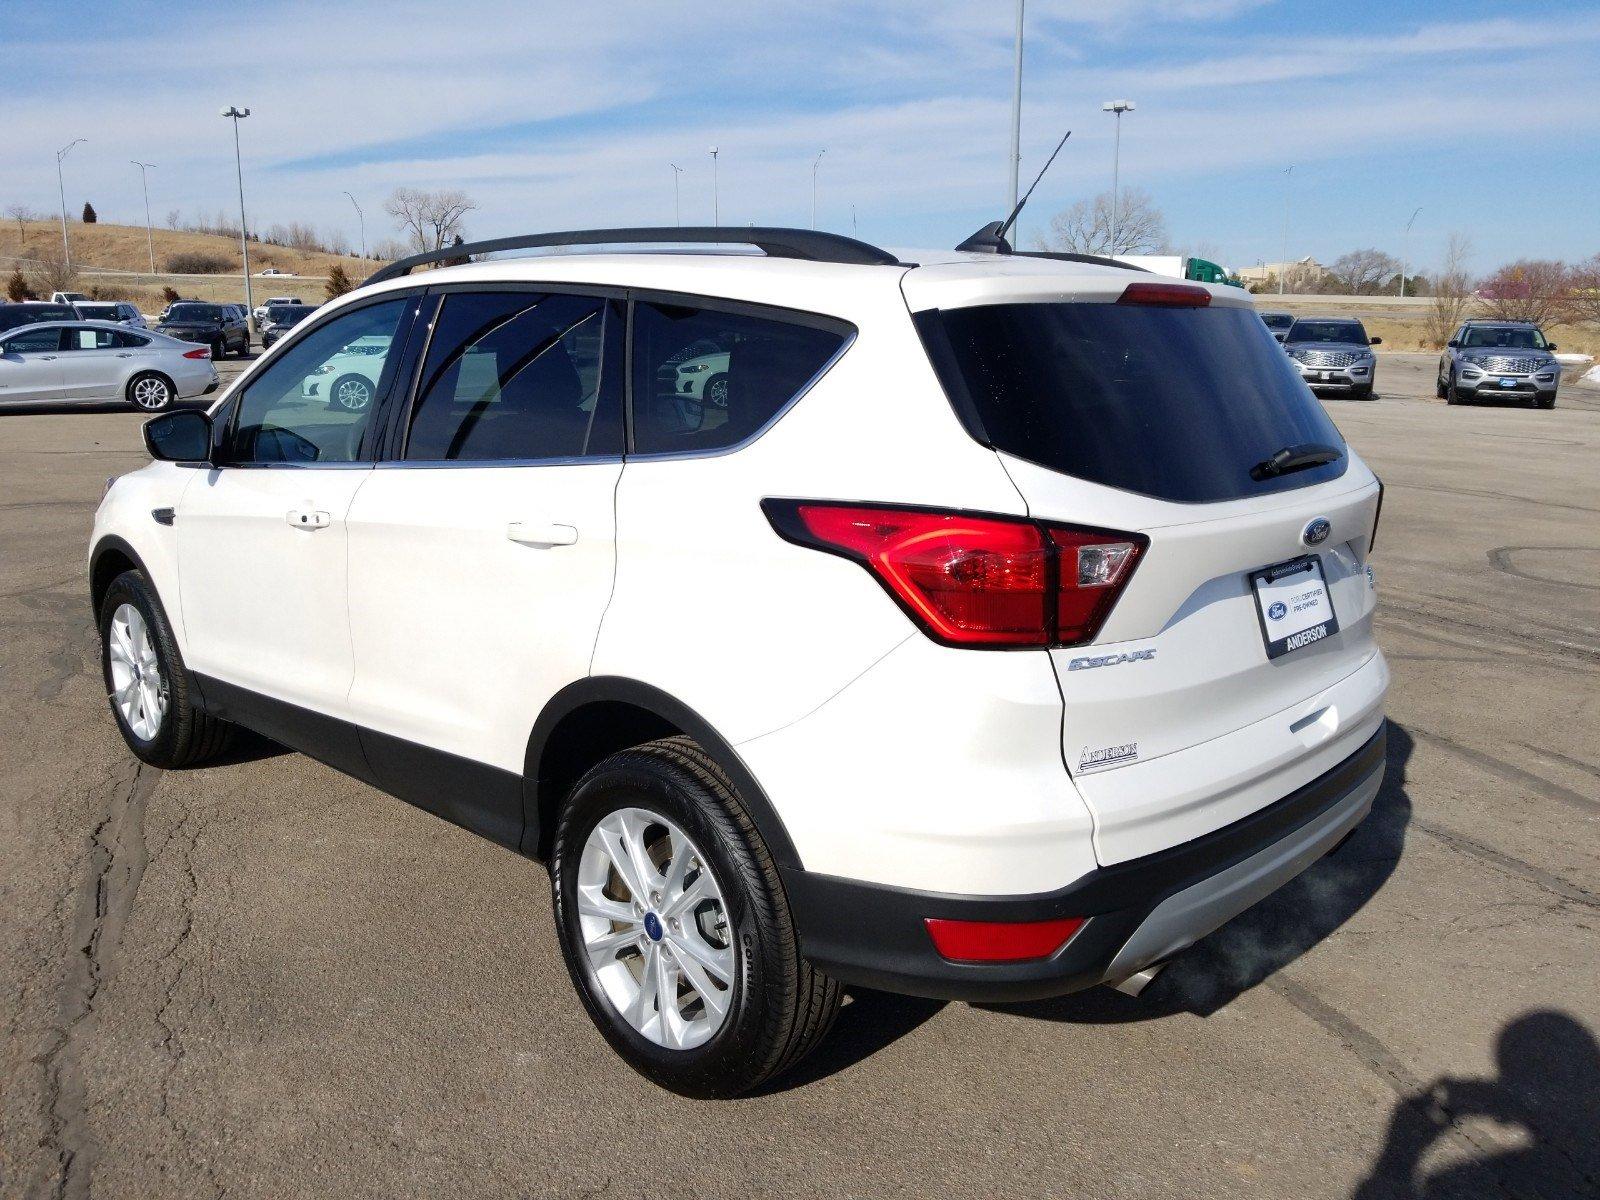 Used 2019 Ford Escape SEL Sport Utility for sale in Lincoln NE